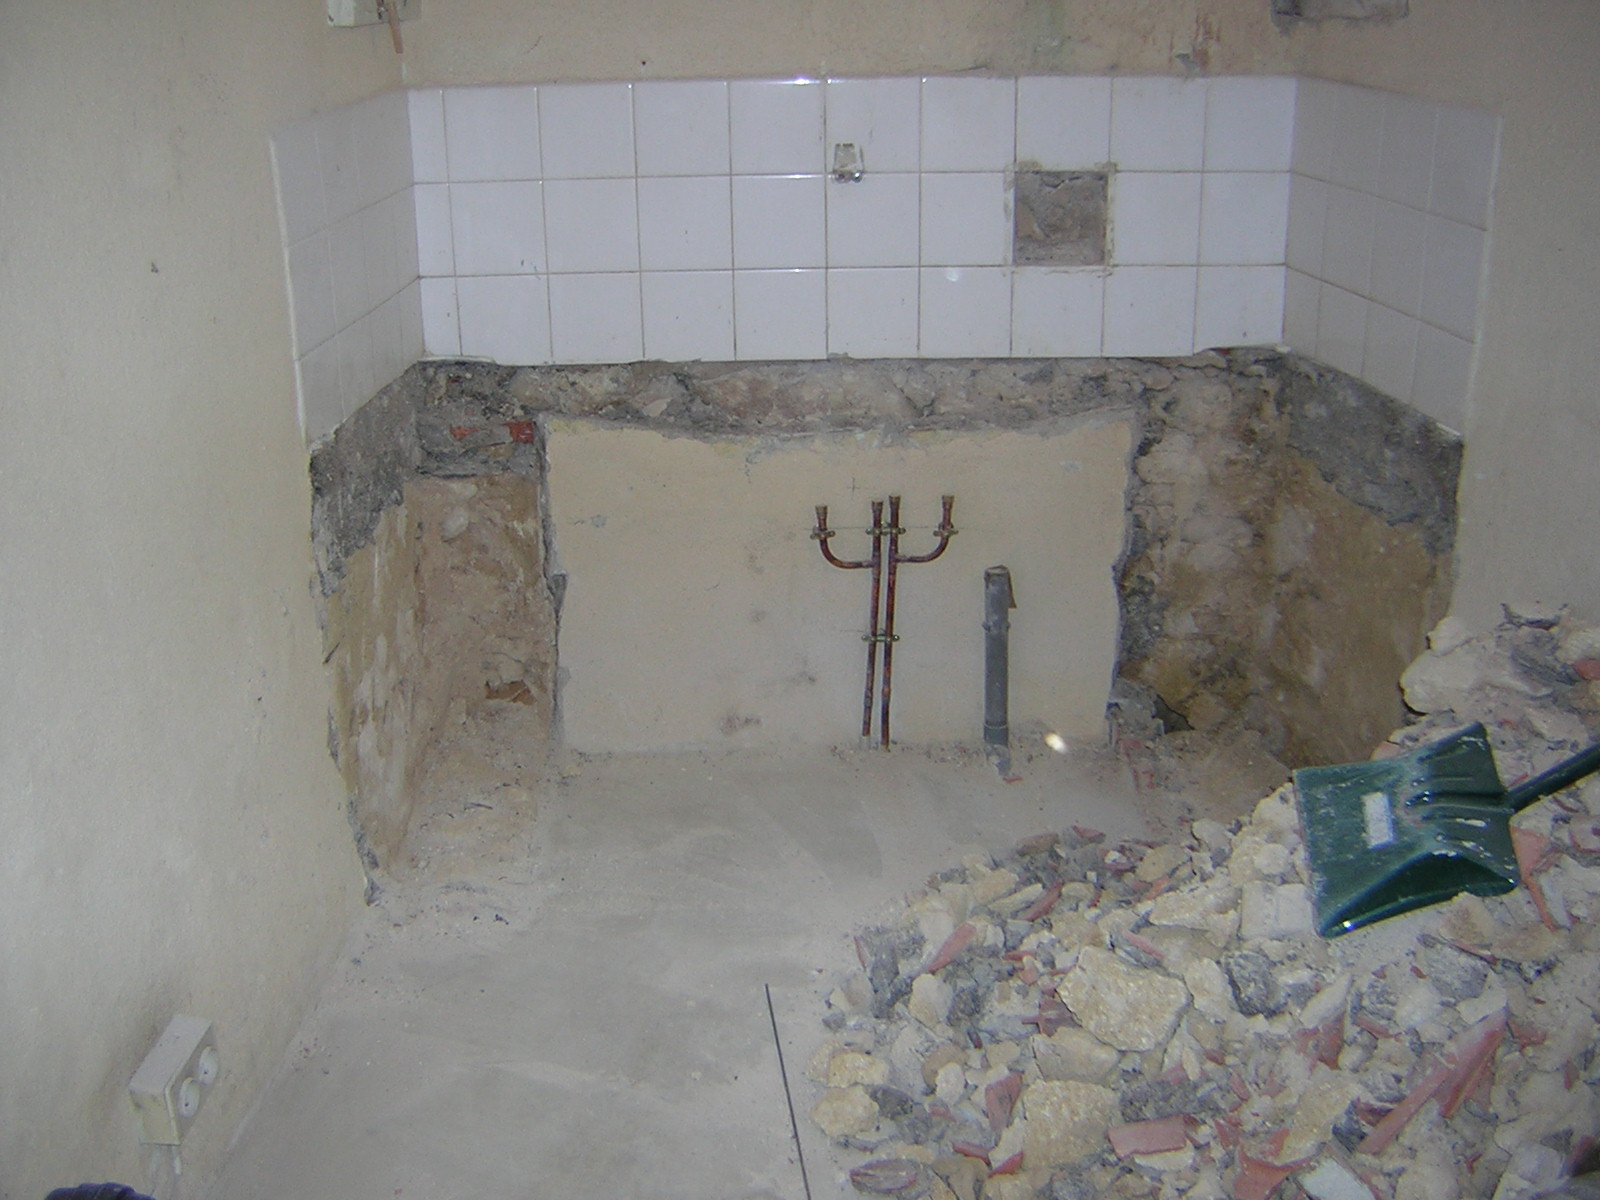 2 eme travaux de la journ e la salle de bain